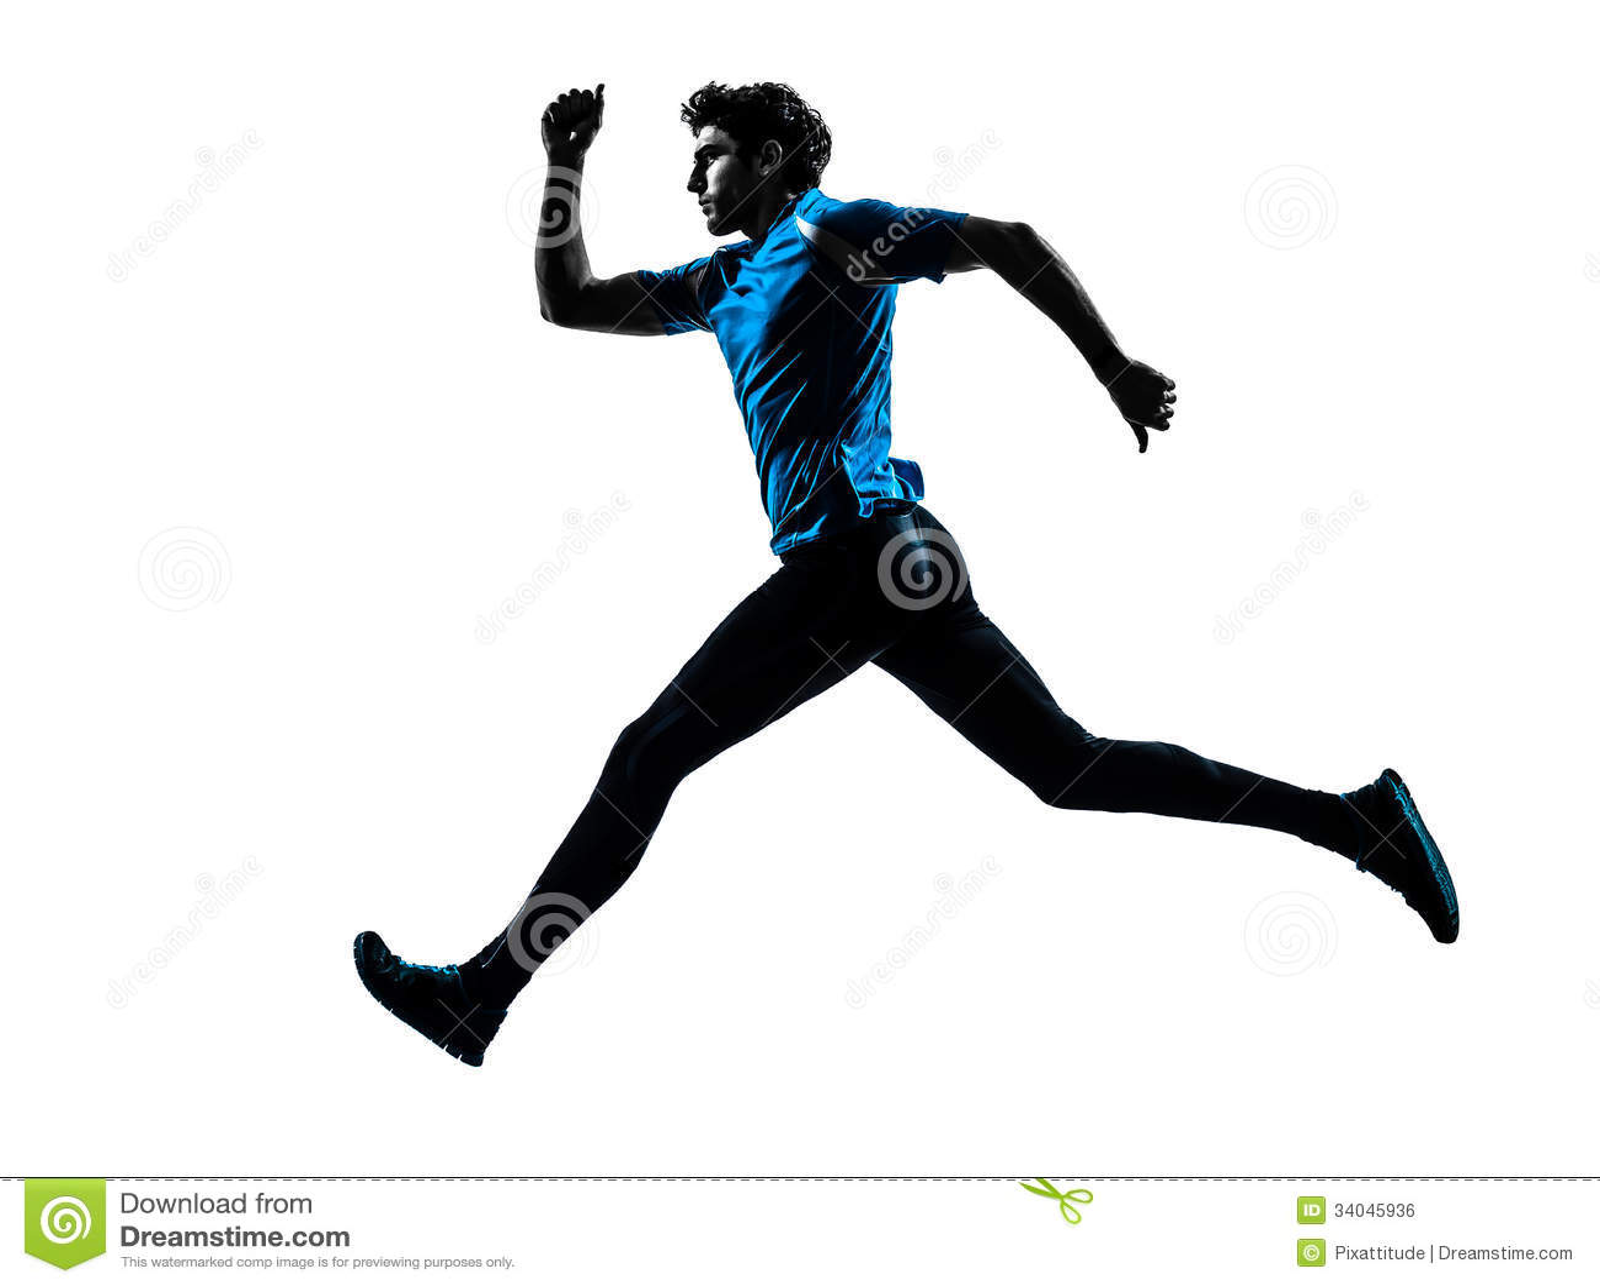 man jogging clipart - photo #43